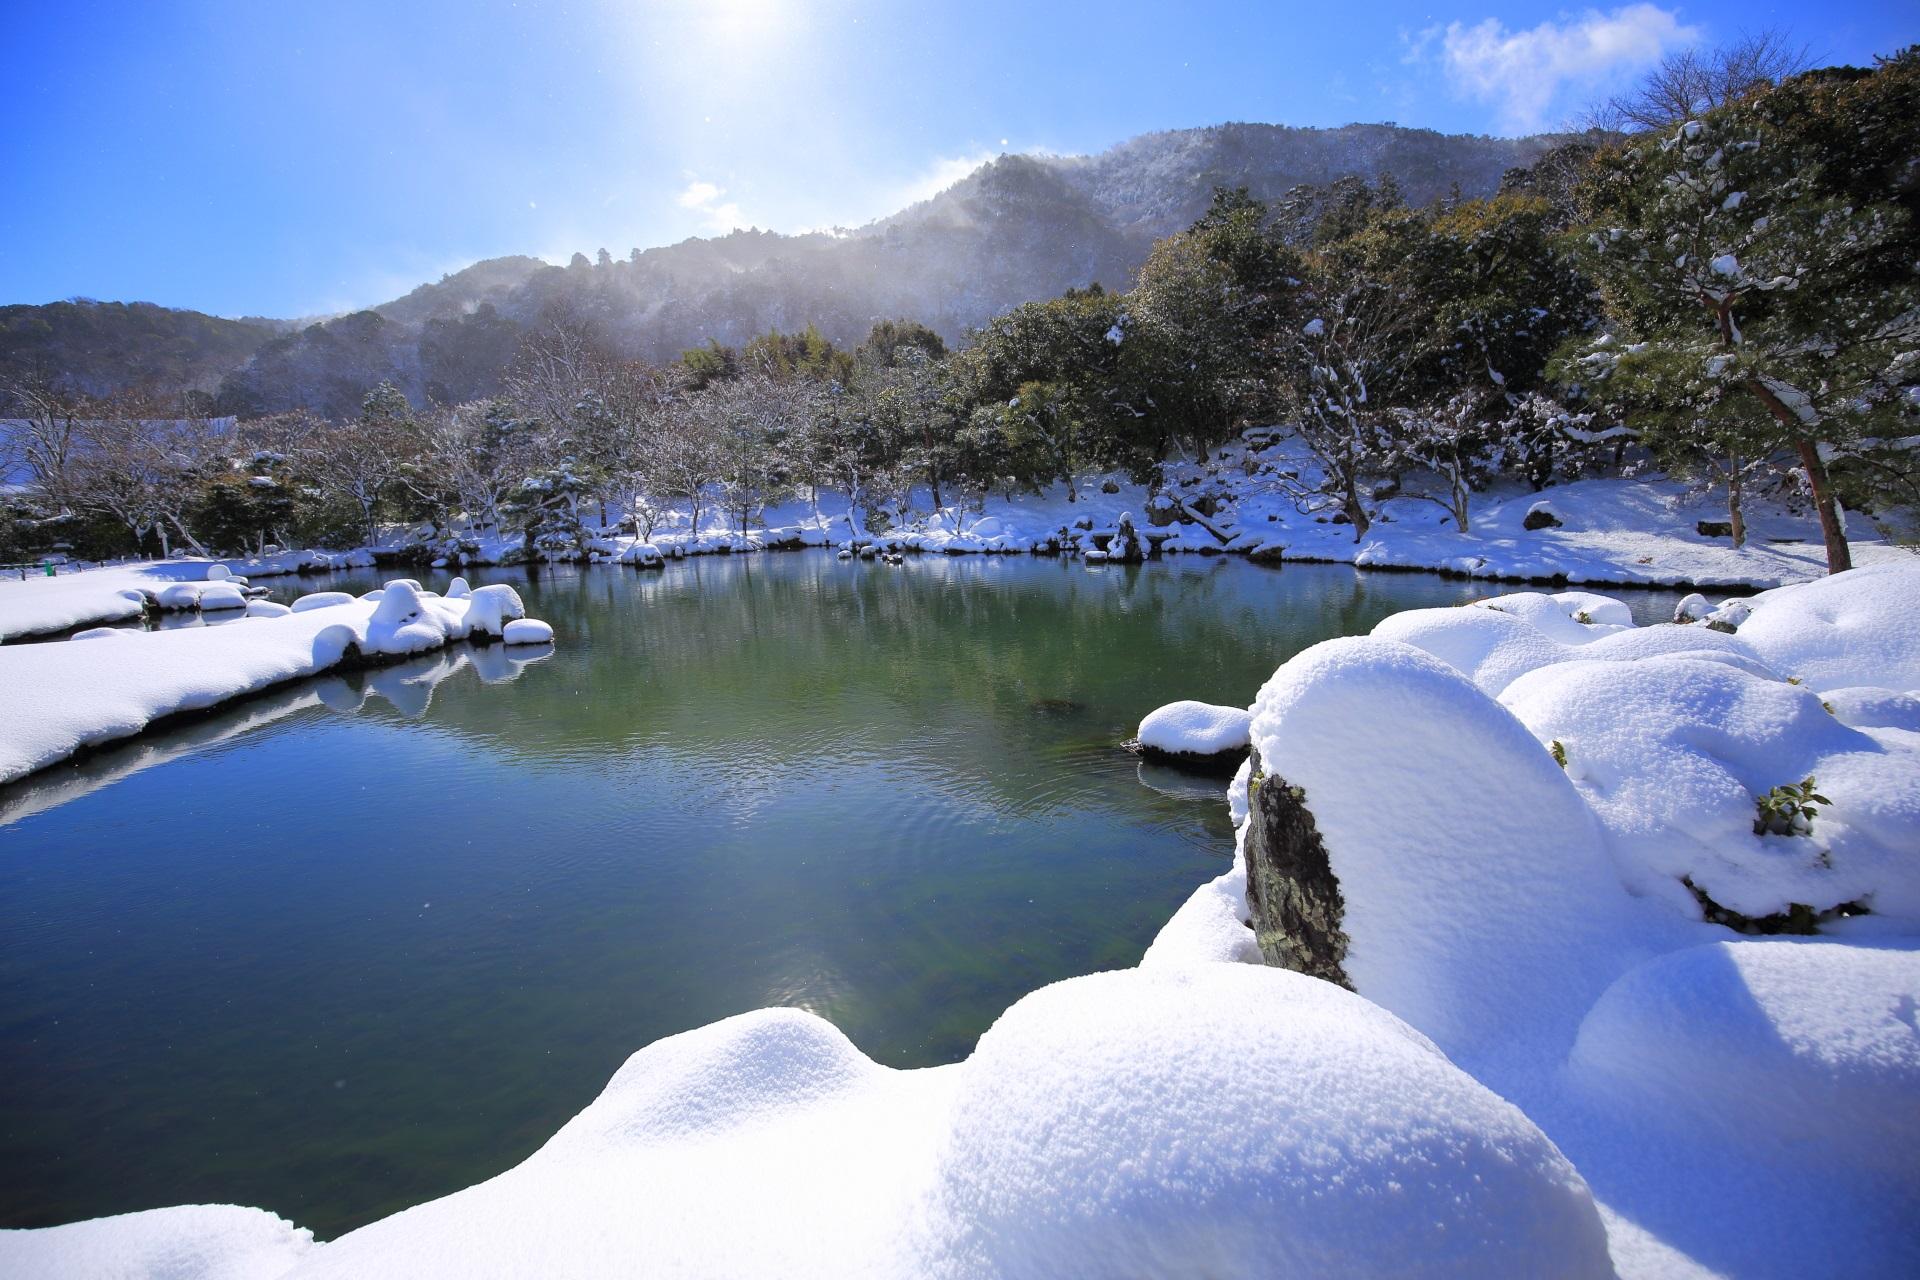 天龍寺 雪 京都嵐山の世界遺産の冬景色